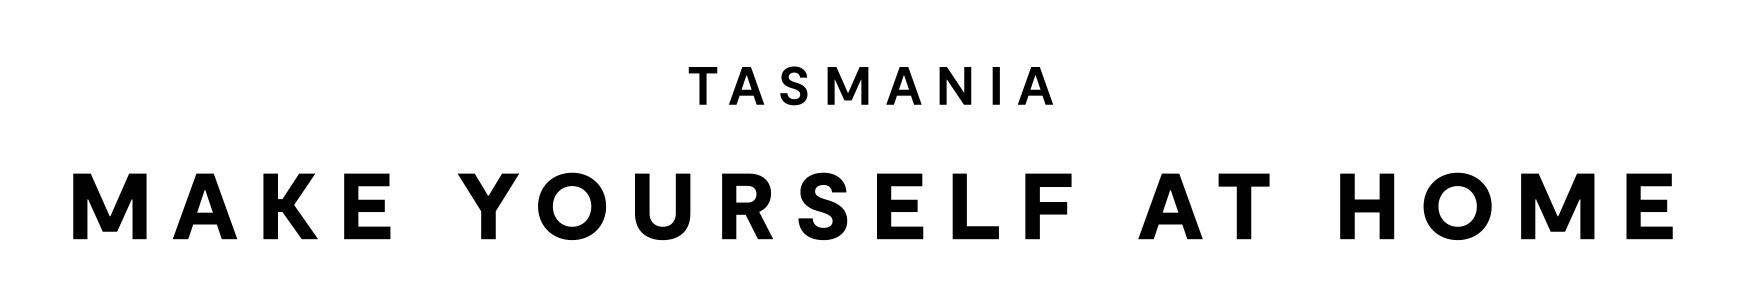 Tasmania - Make Yourself at Home